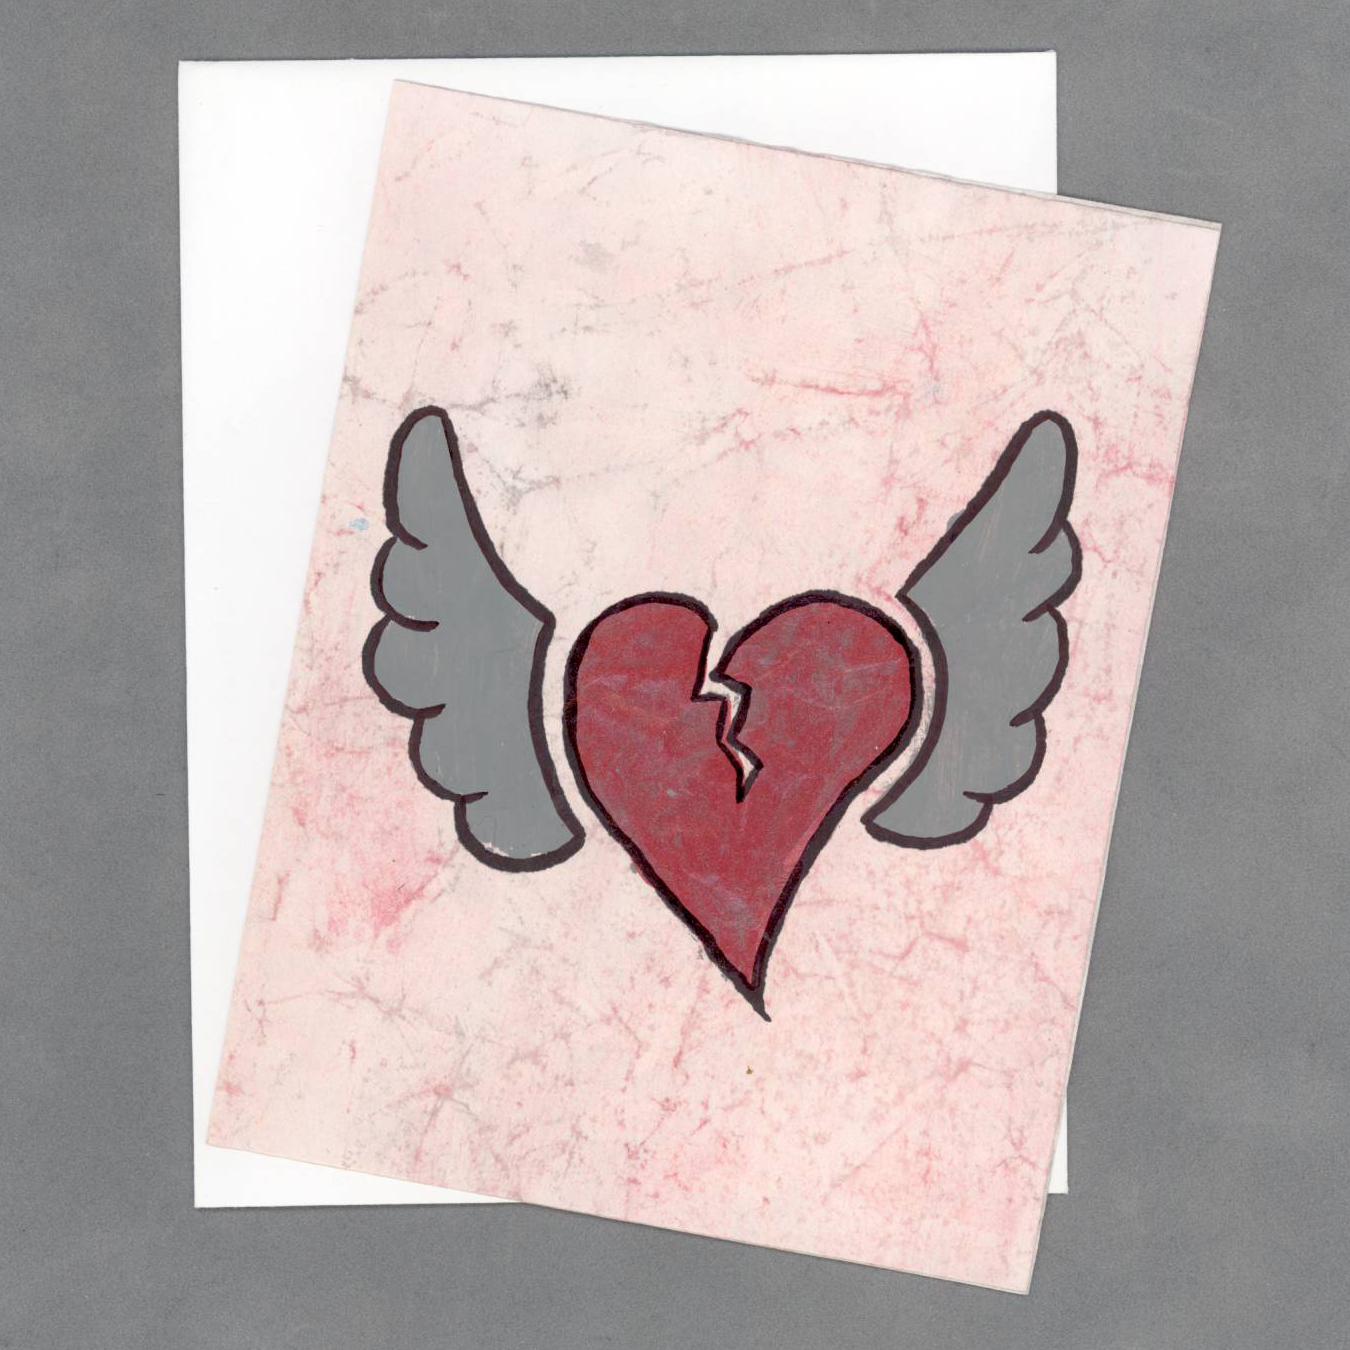 CA028HEA_RedSilver_HeartTakesFlightHandPaintedCardByWildeDesigns_01